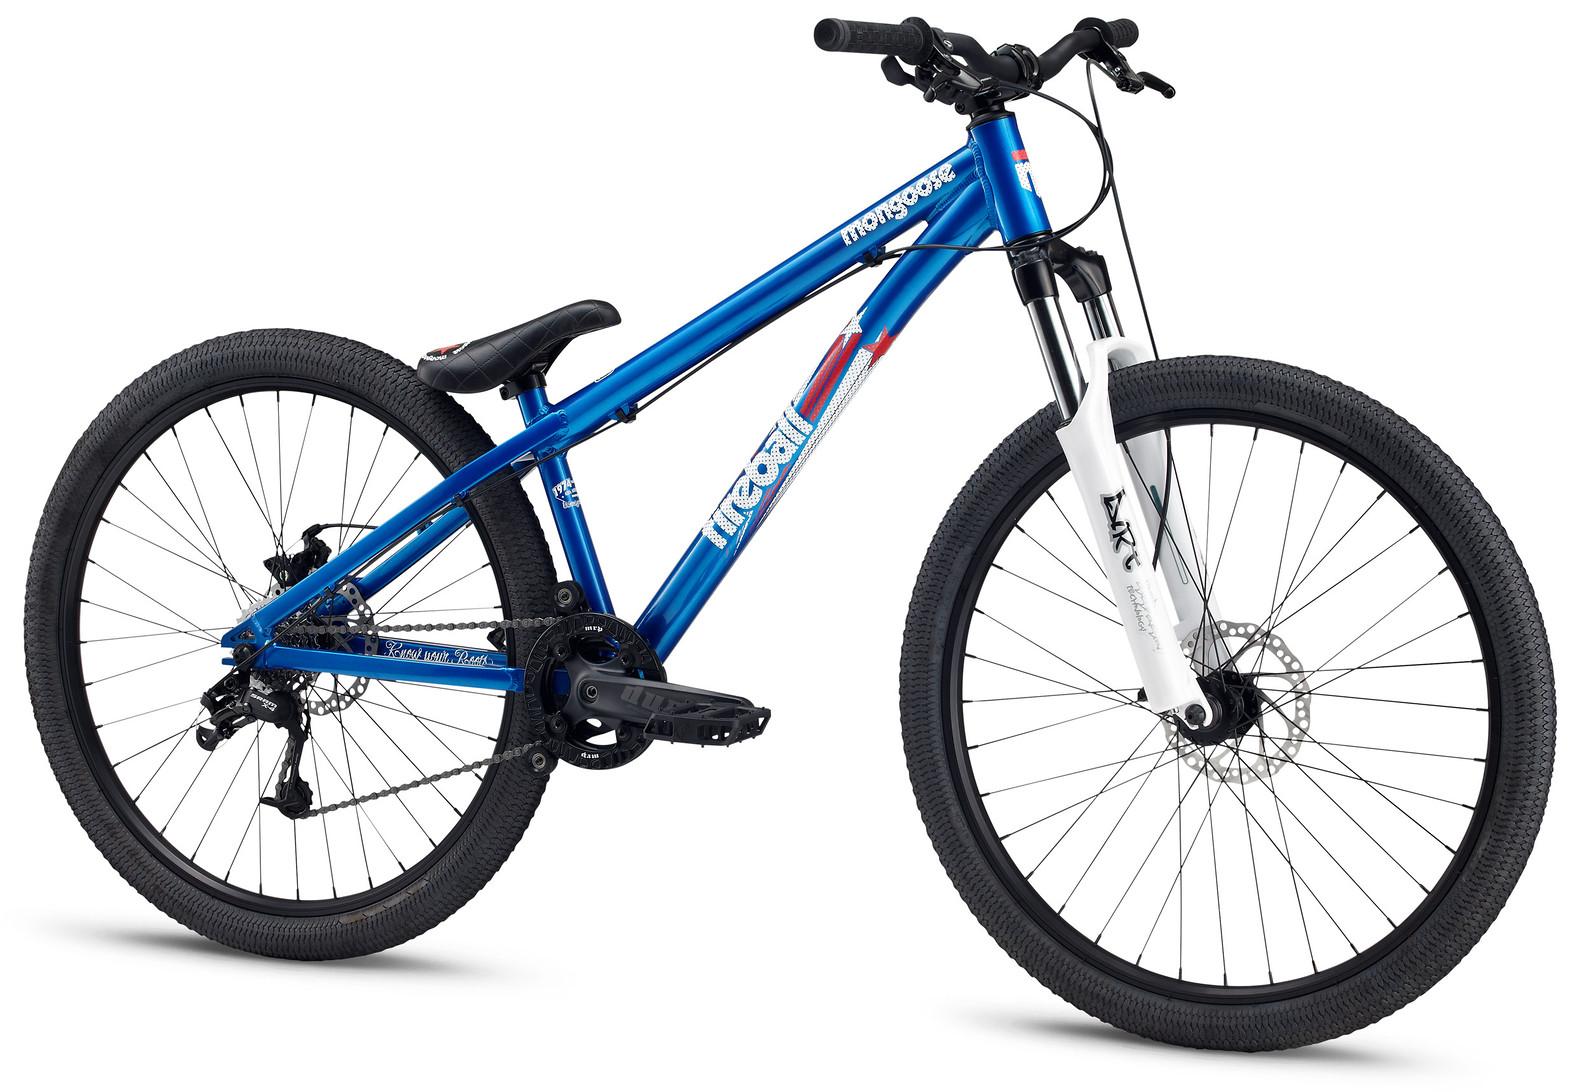 2014 Mongoose Fireball 26 Bike 2014 Mongoose Fireball 26 Bike